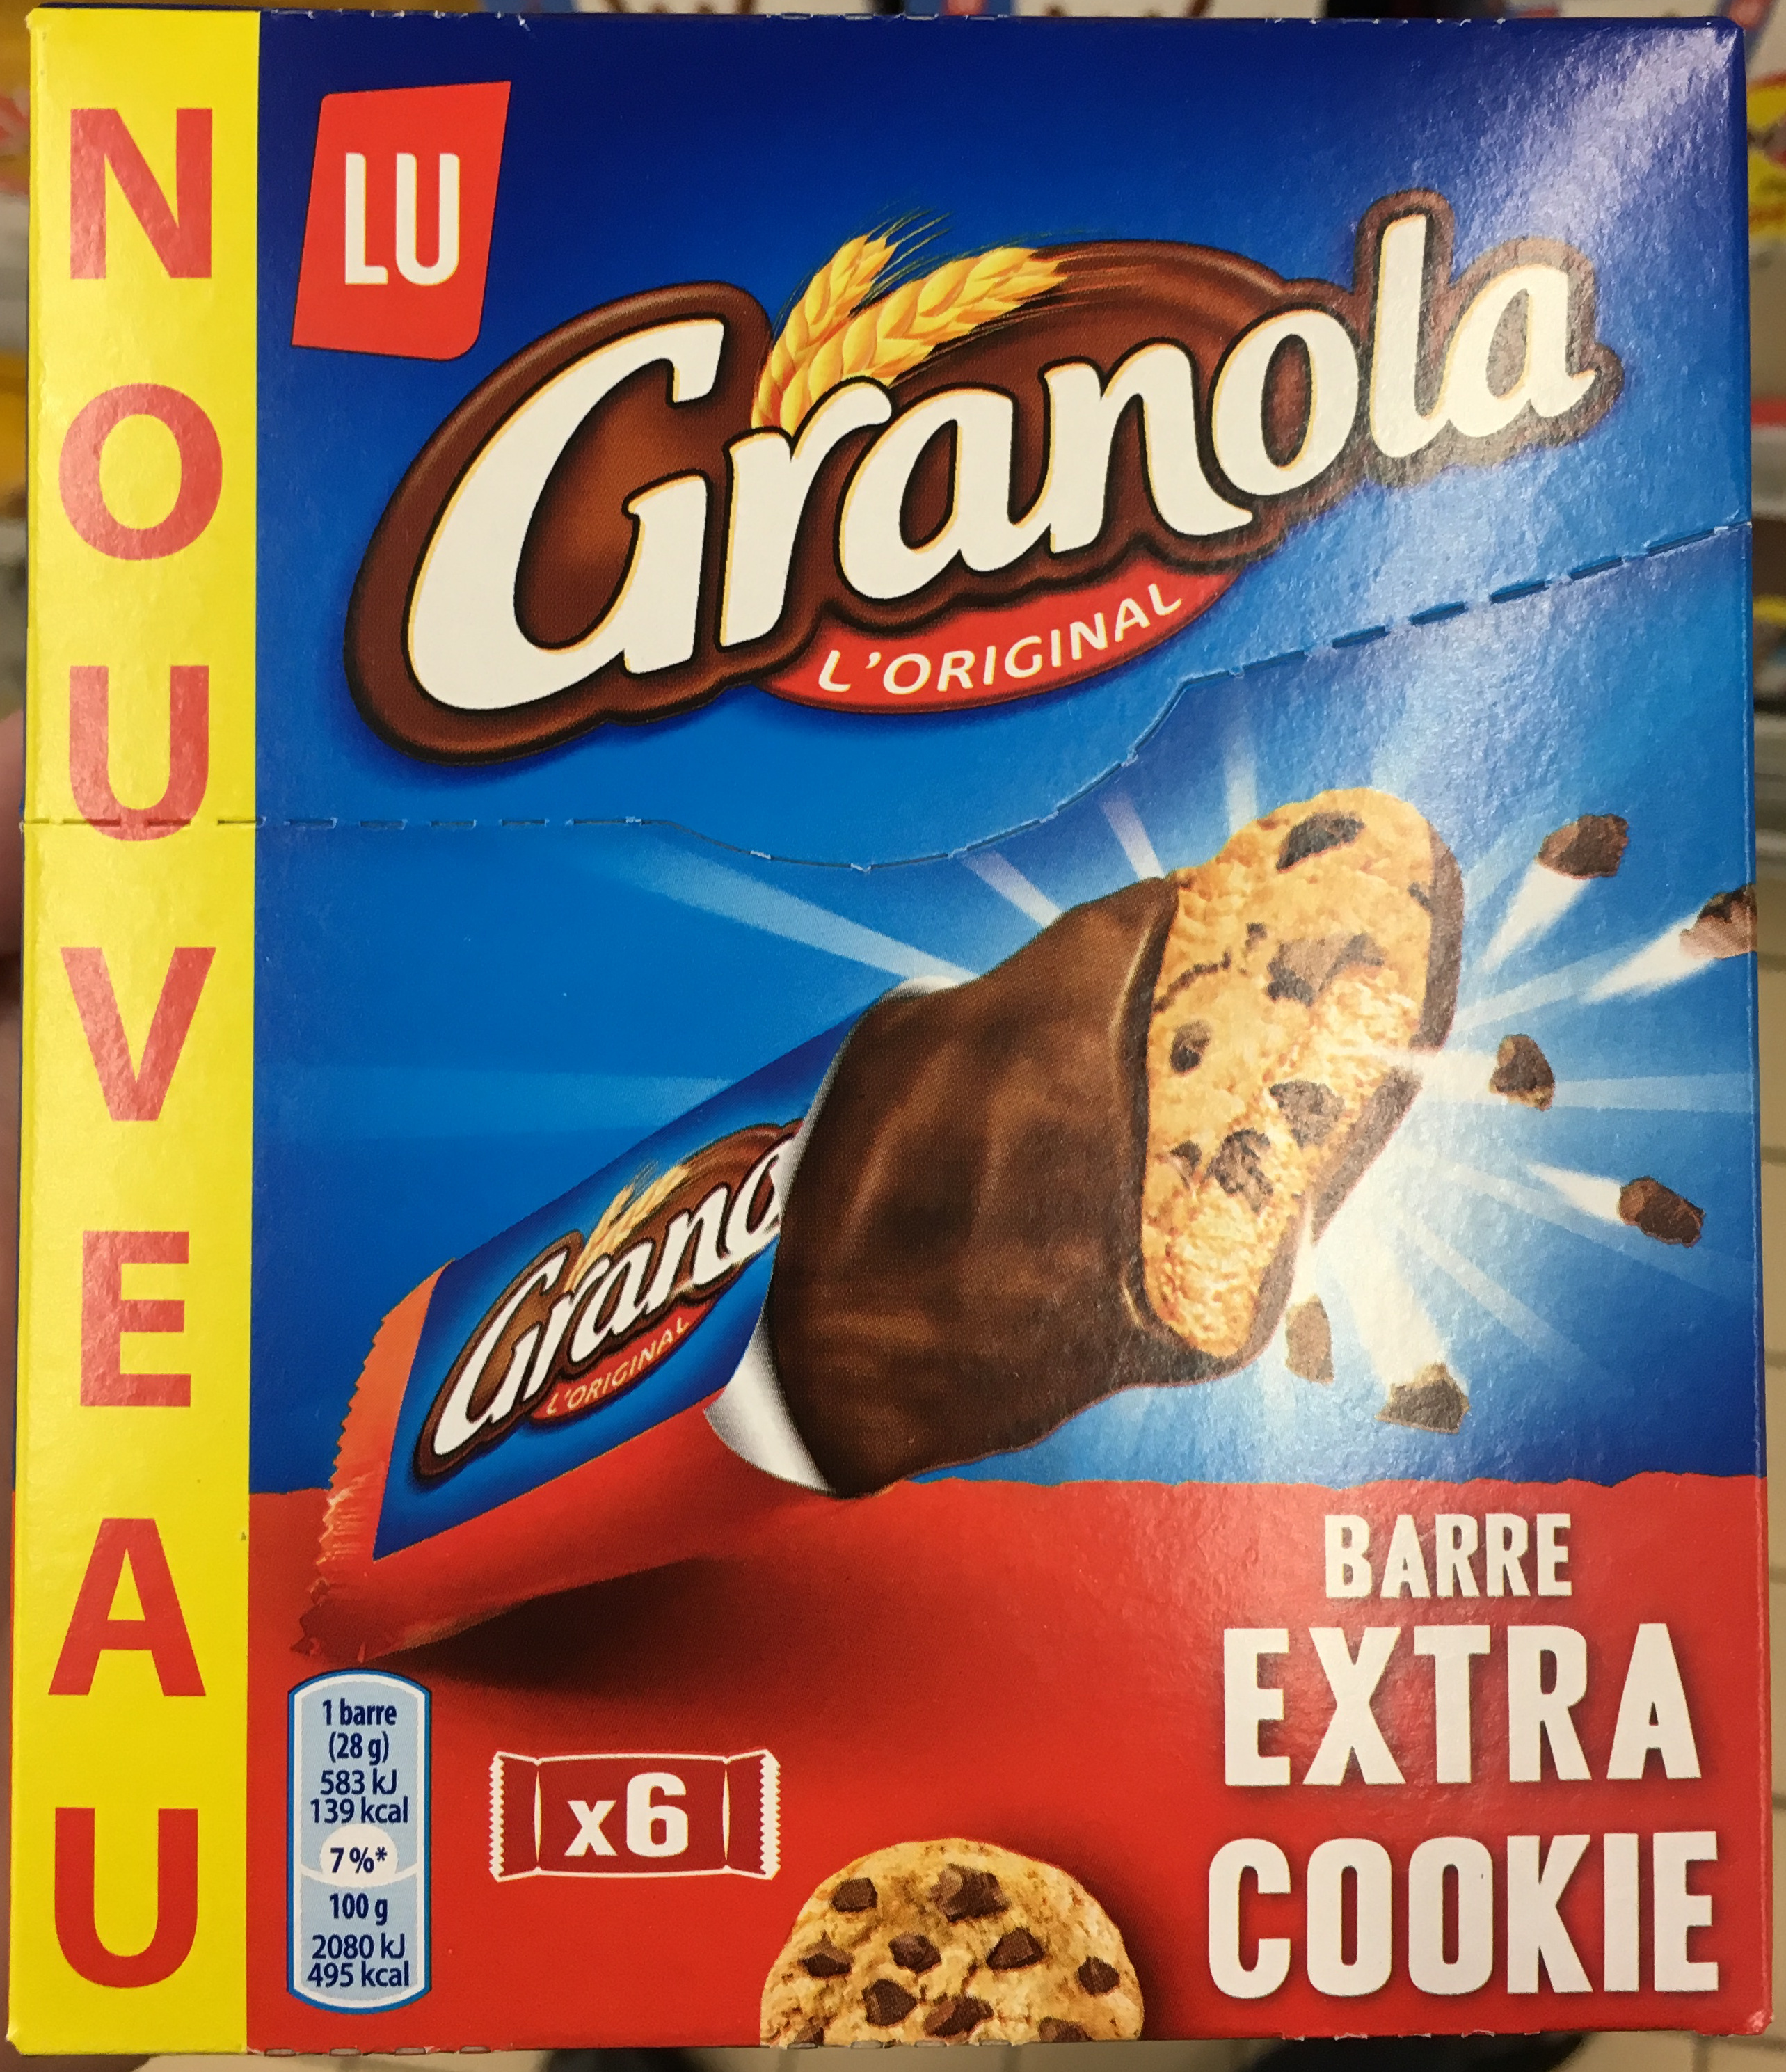 granola barre extra cookie lu 6 28 g. Black Bedroom Furniture Sets. Home Design Ideas